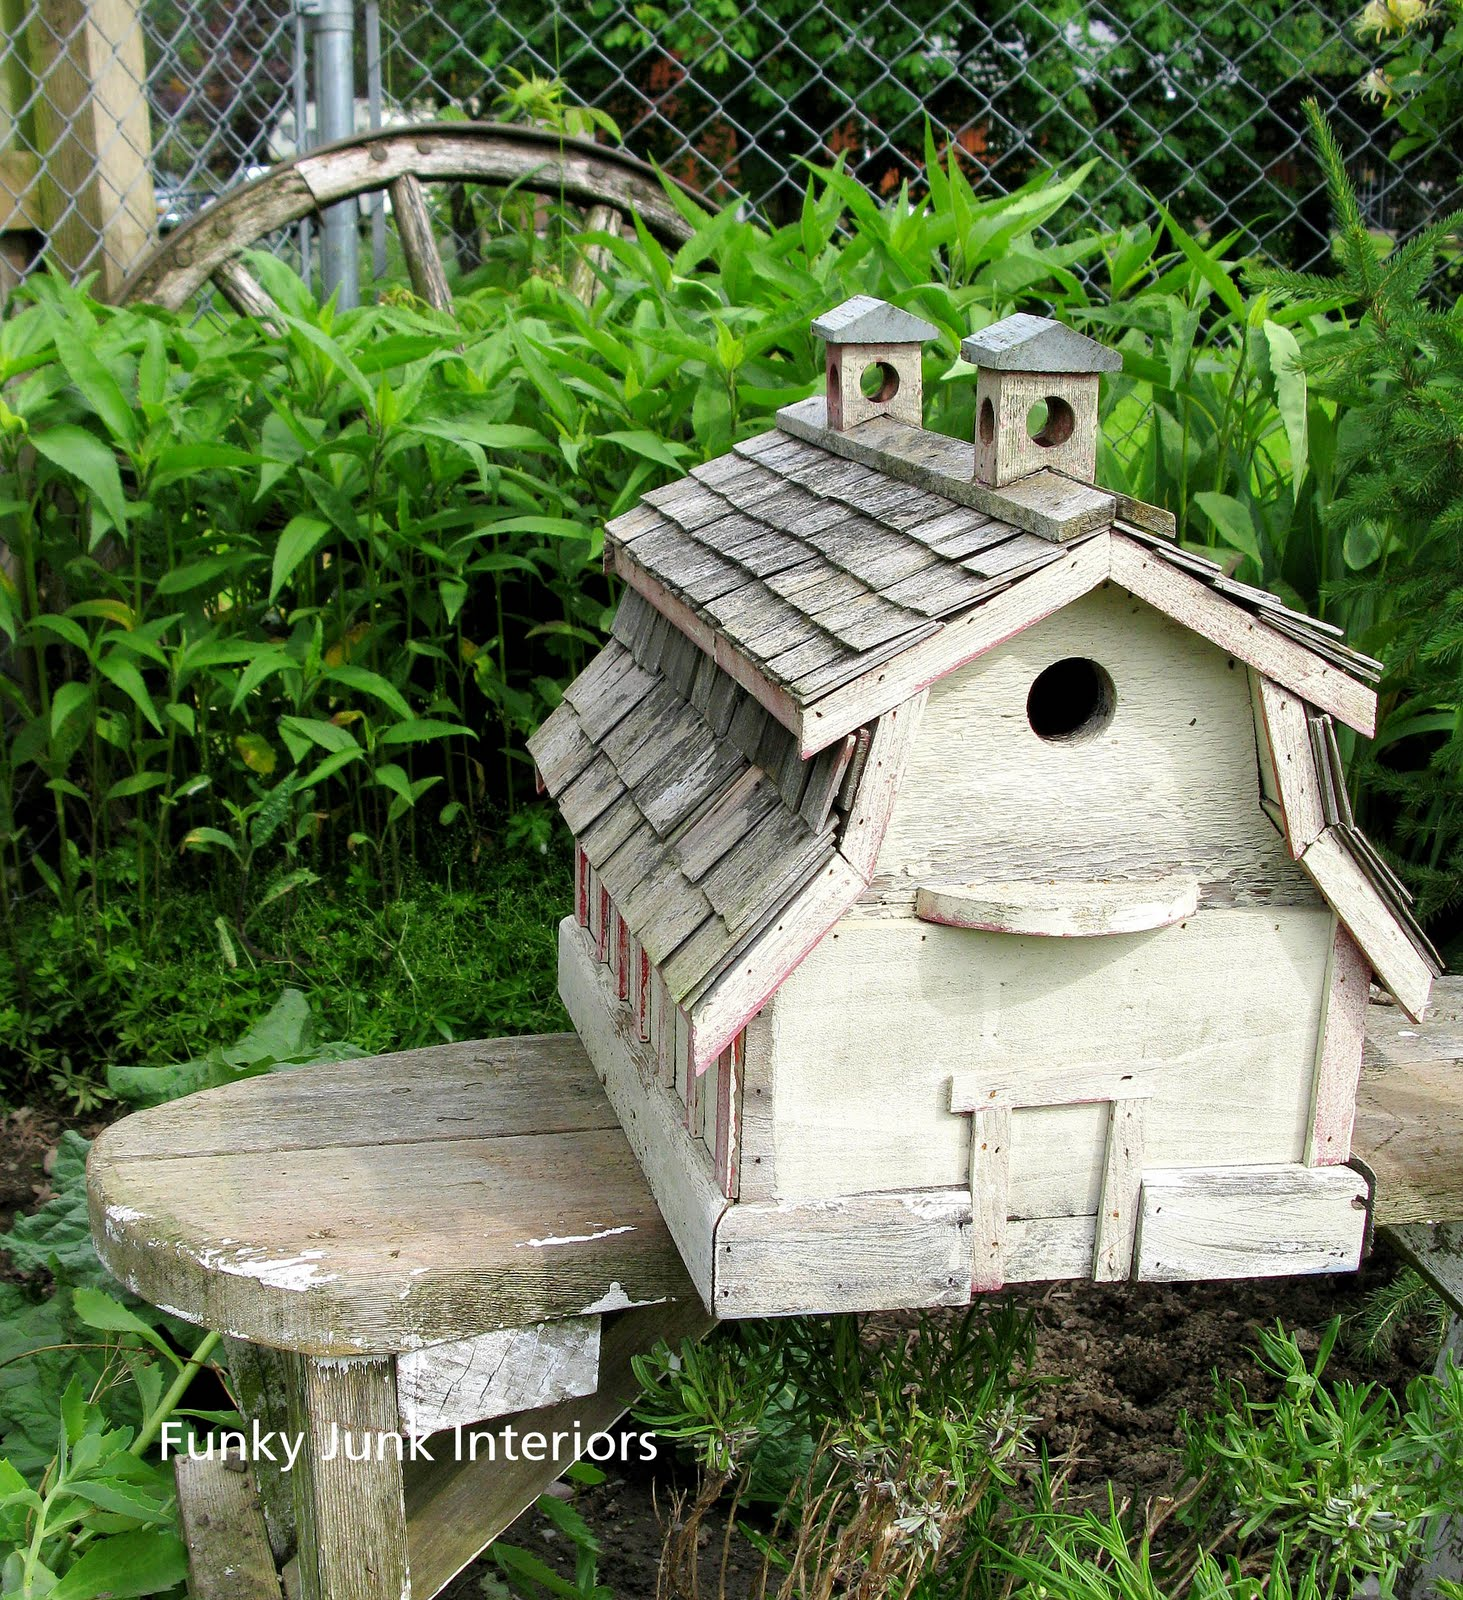 Funky Bird Homesfunky Junk Interiors